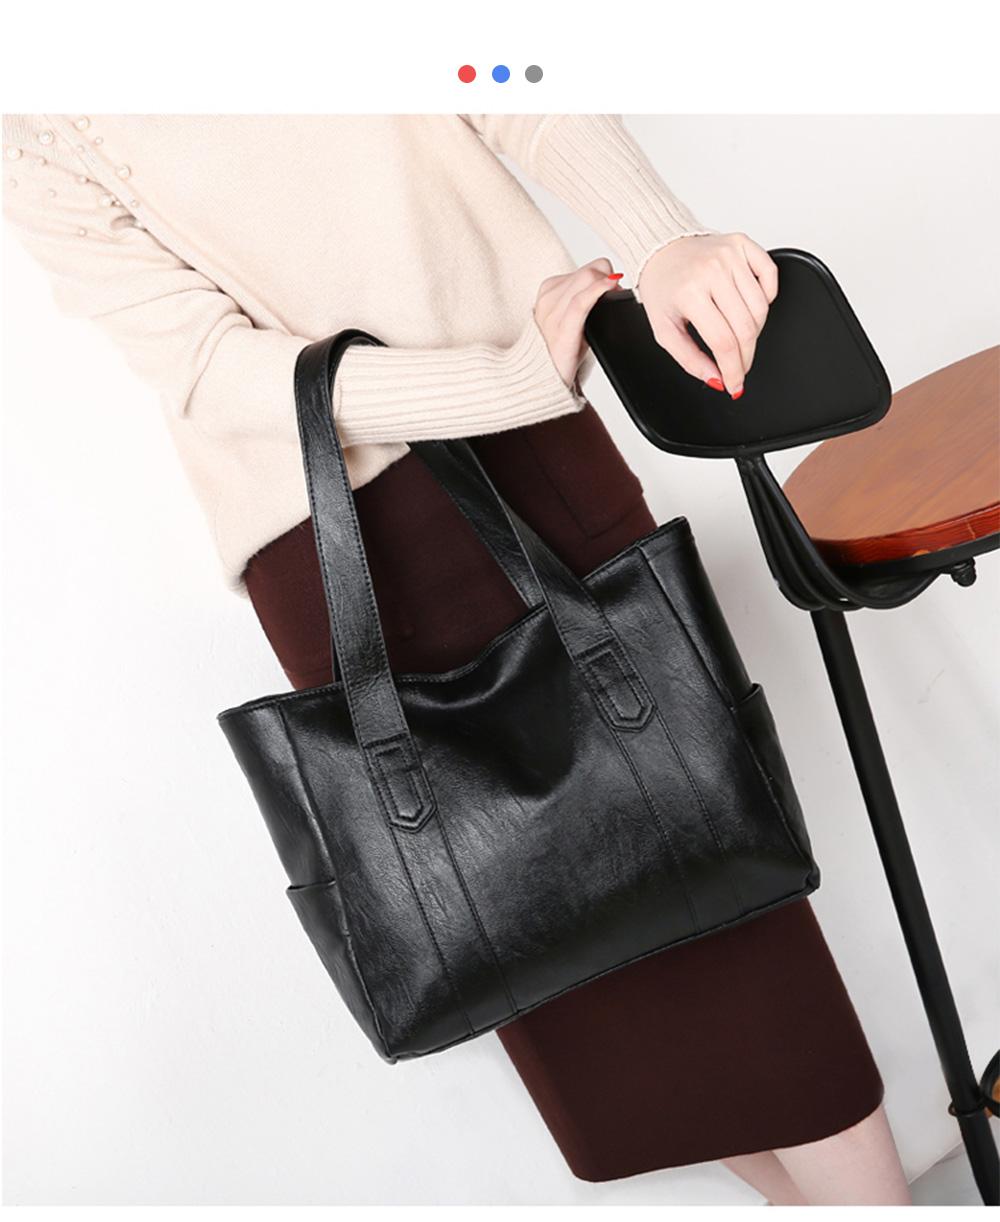 Durable Soft Elegant Women's Shoulder Bag, Large Capacity Sleek Women's Briefcase Handbag for Shipping, Outdoors, Traveling 11